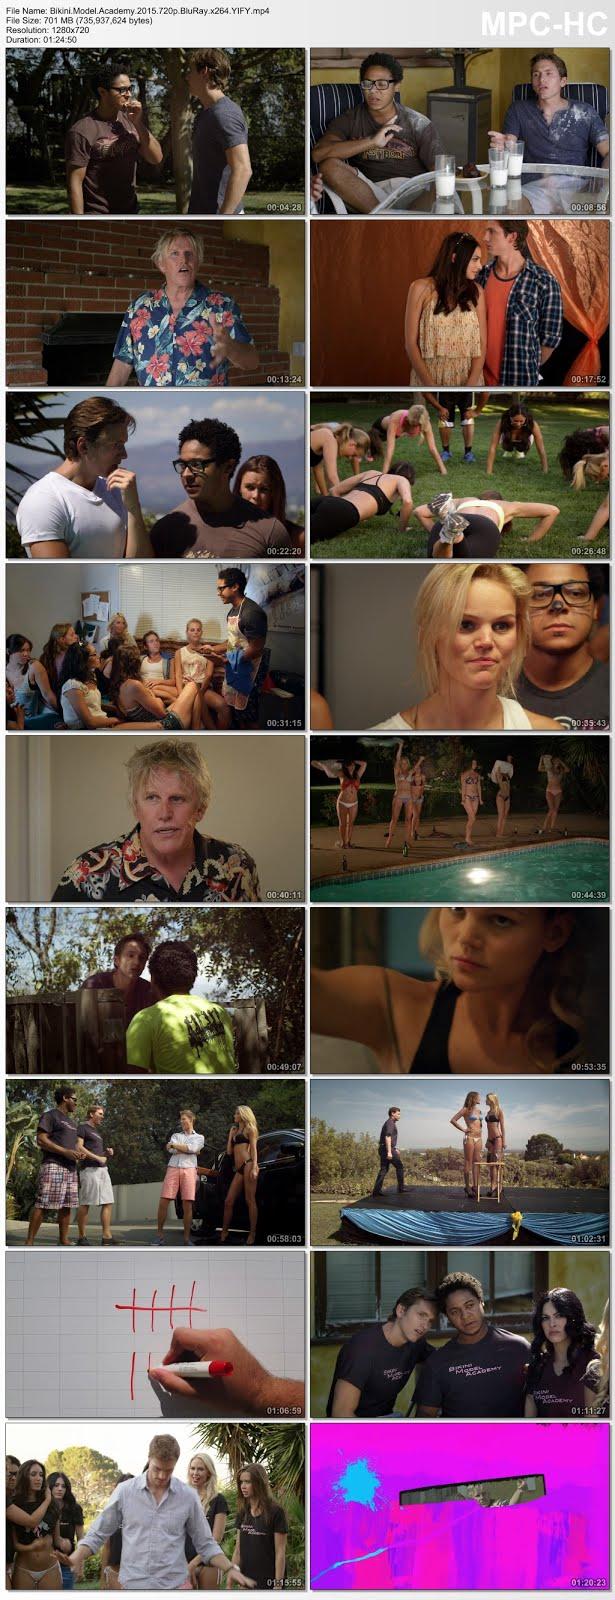 bikini model academy full movie free download